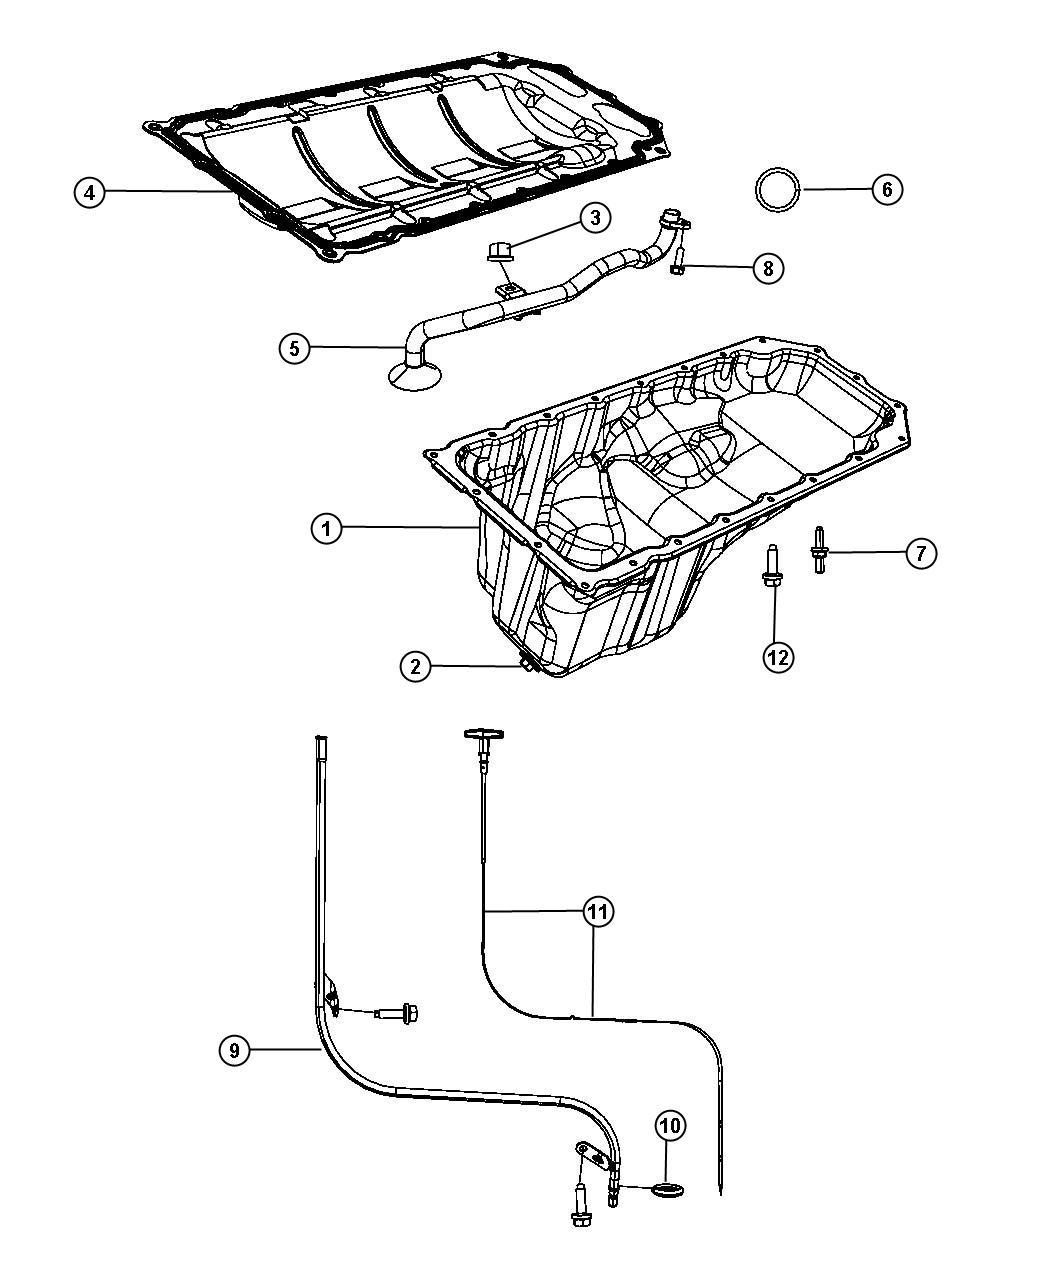 Dodge Durango Pan. Engine oil. Hemi, indicator, mds